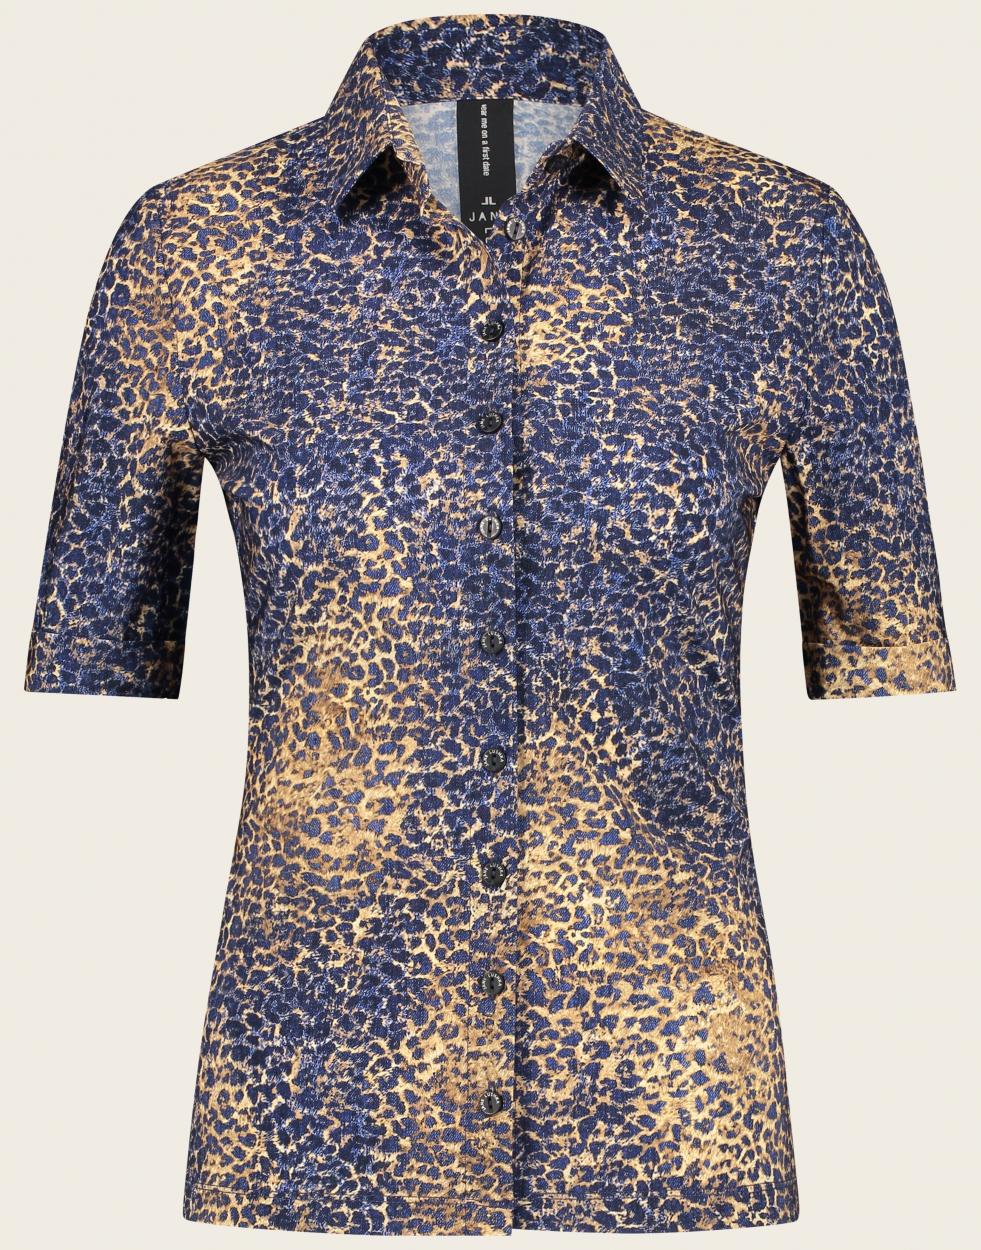 Jane Lushka halbarm Bluse mit Leopardenmuster blau